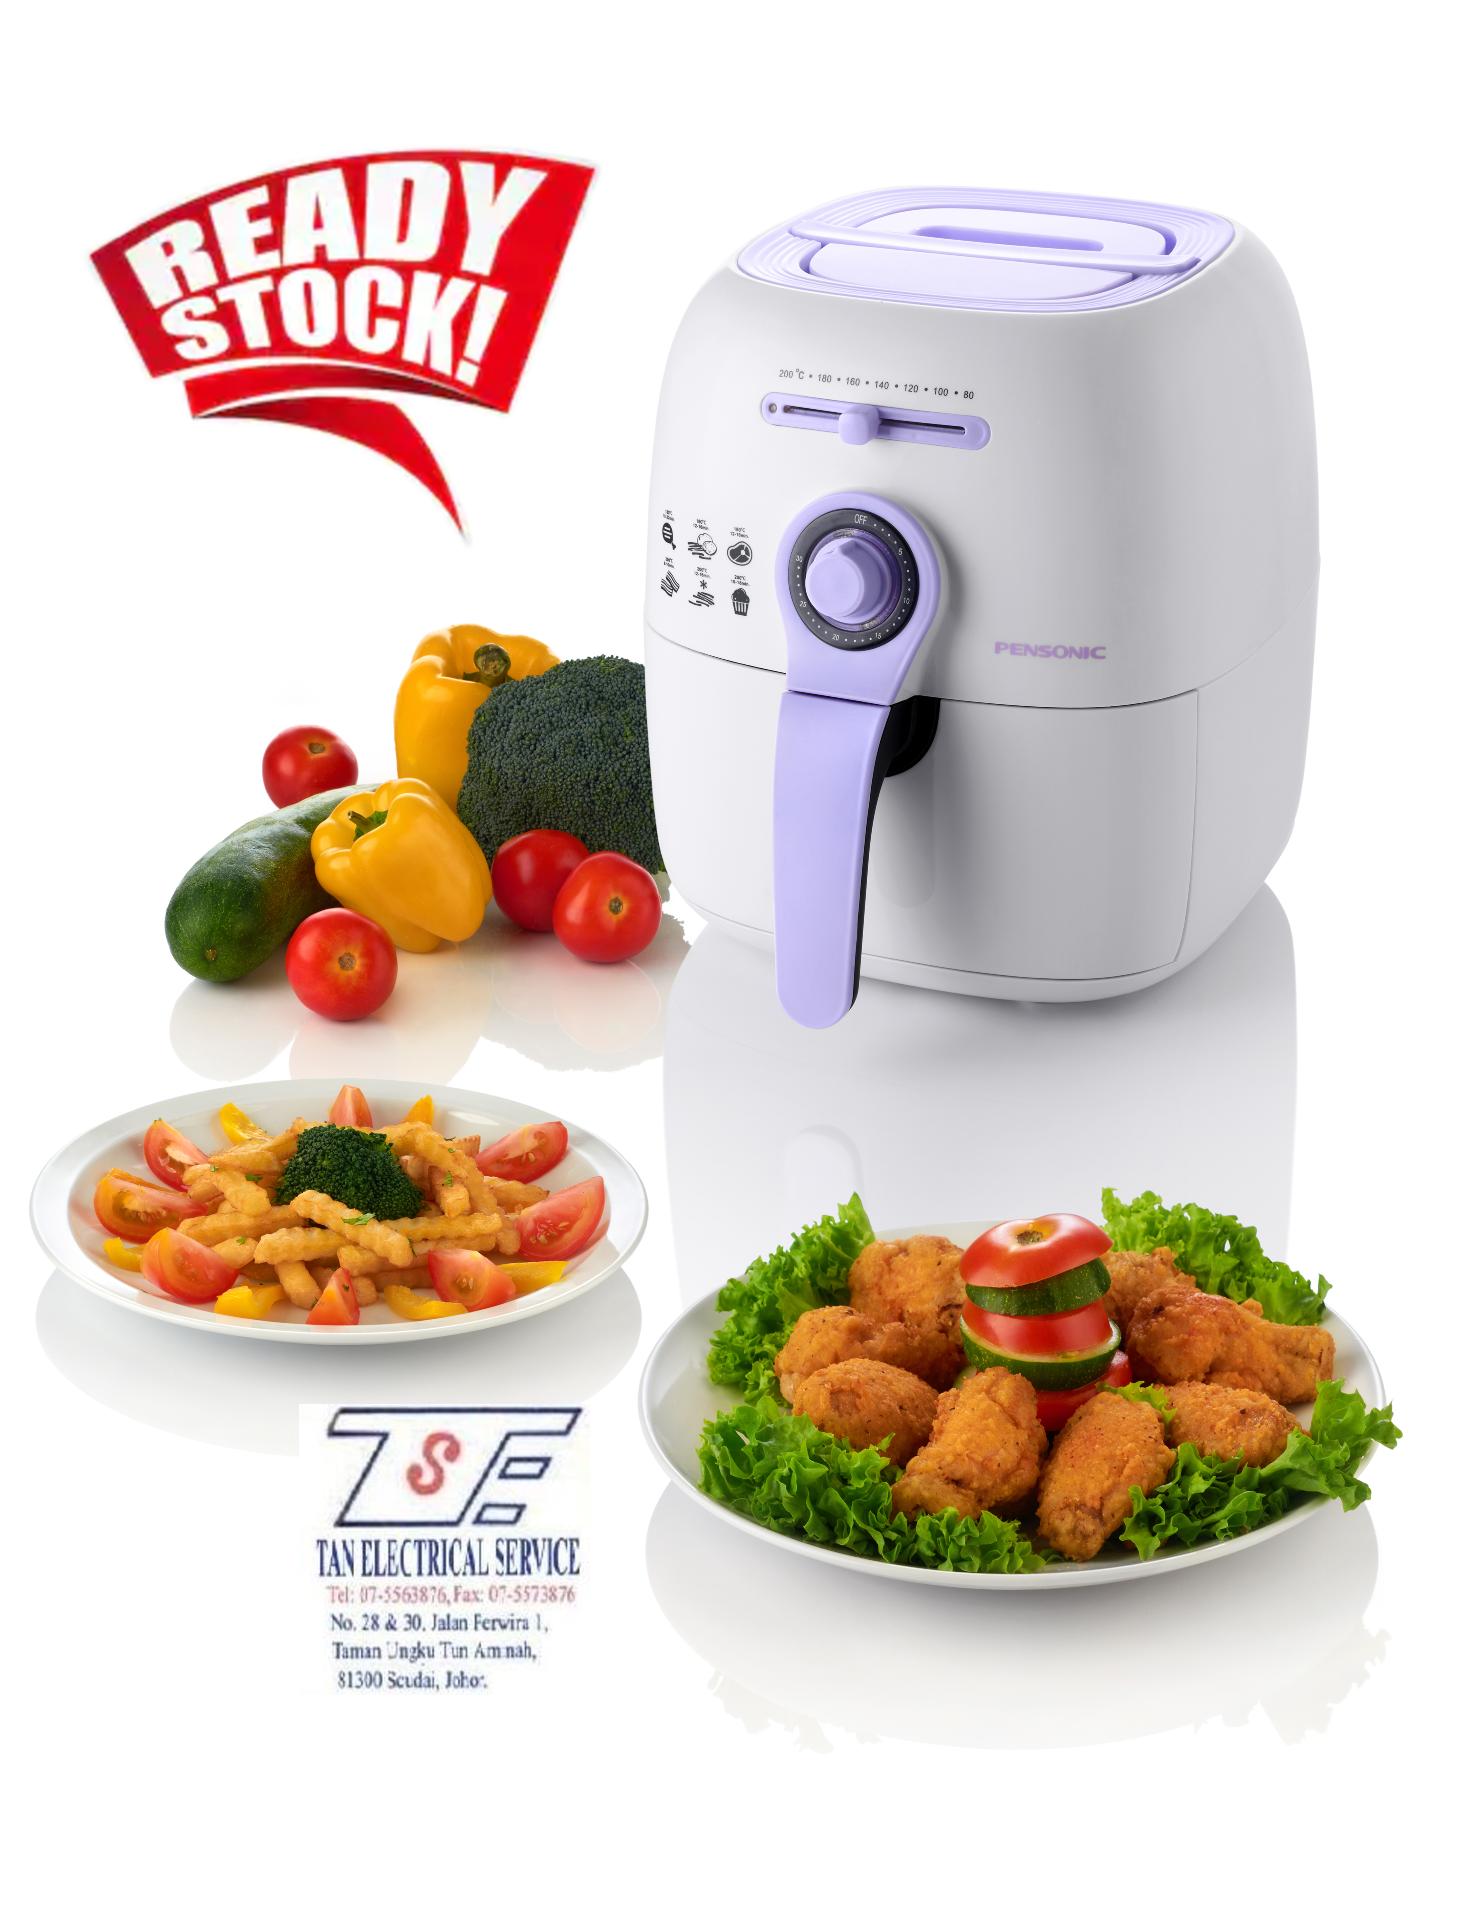 Pensonic 2.2L Chef's Like Series Air Fryer 1200-1400W PDF-2201 Air Fryers 空气炸锅